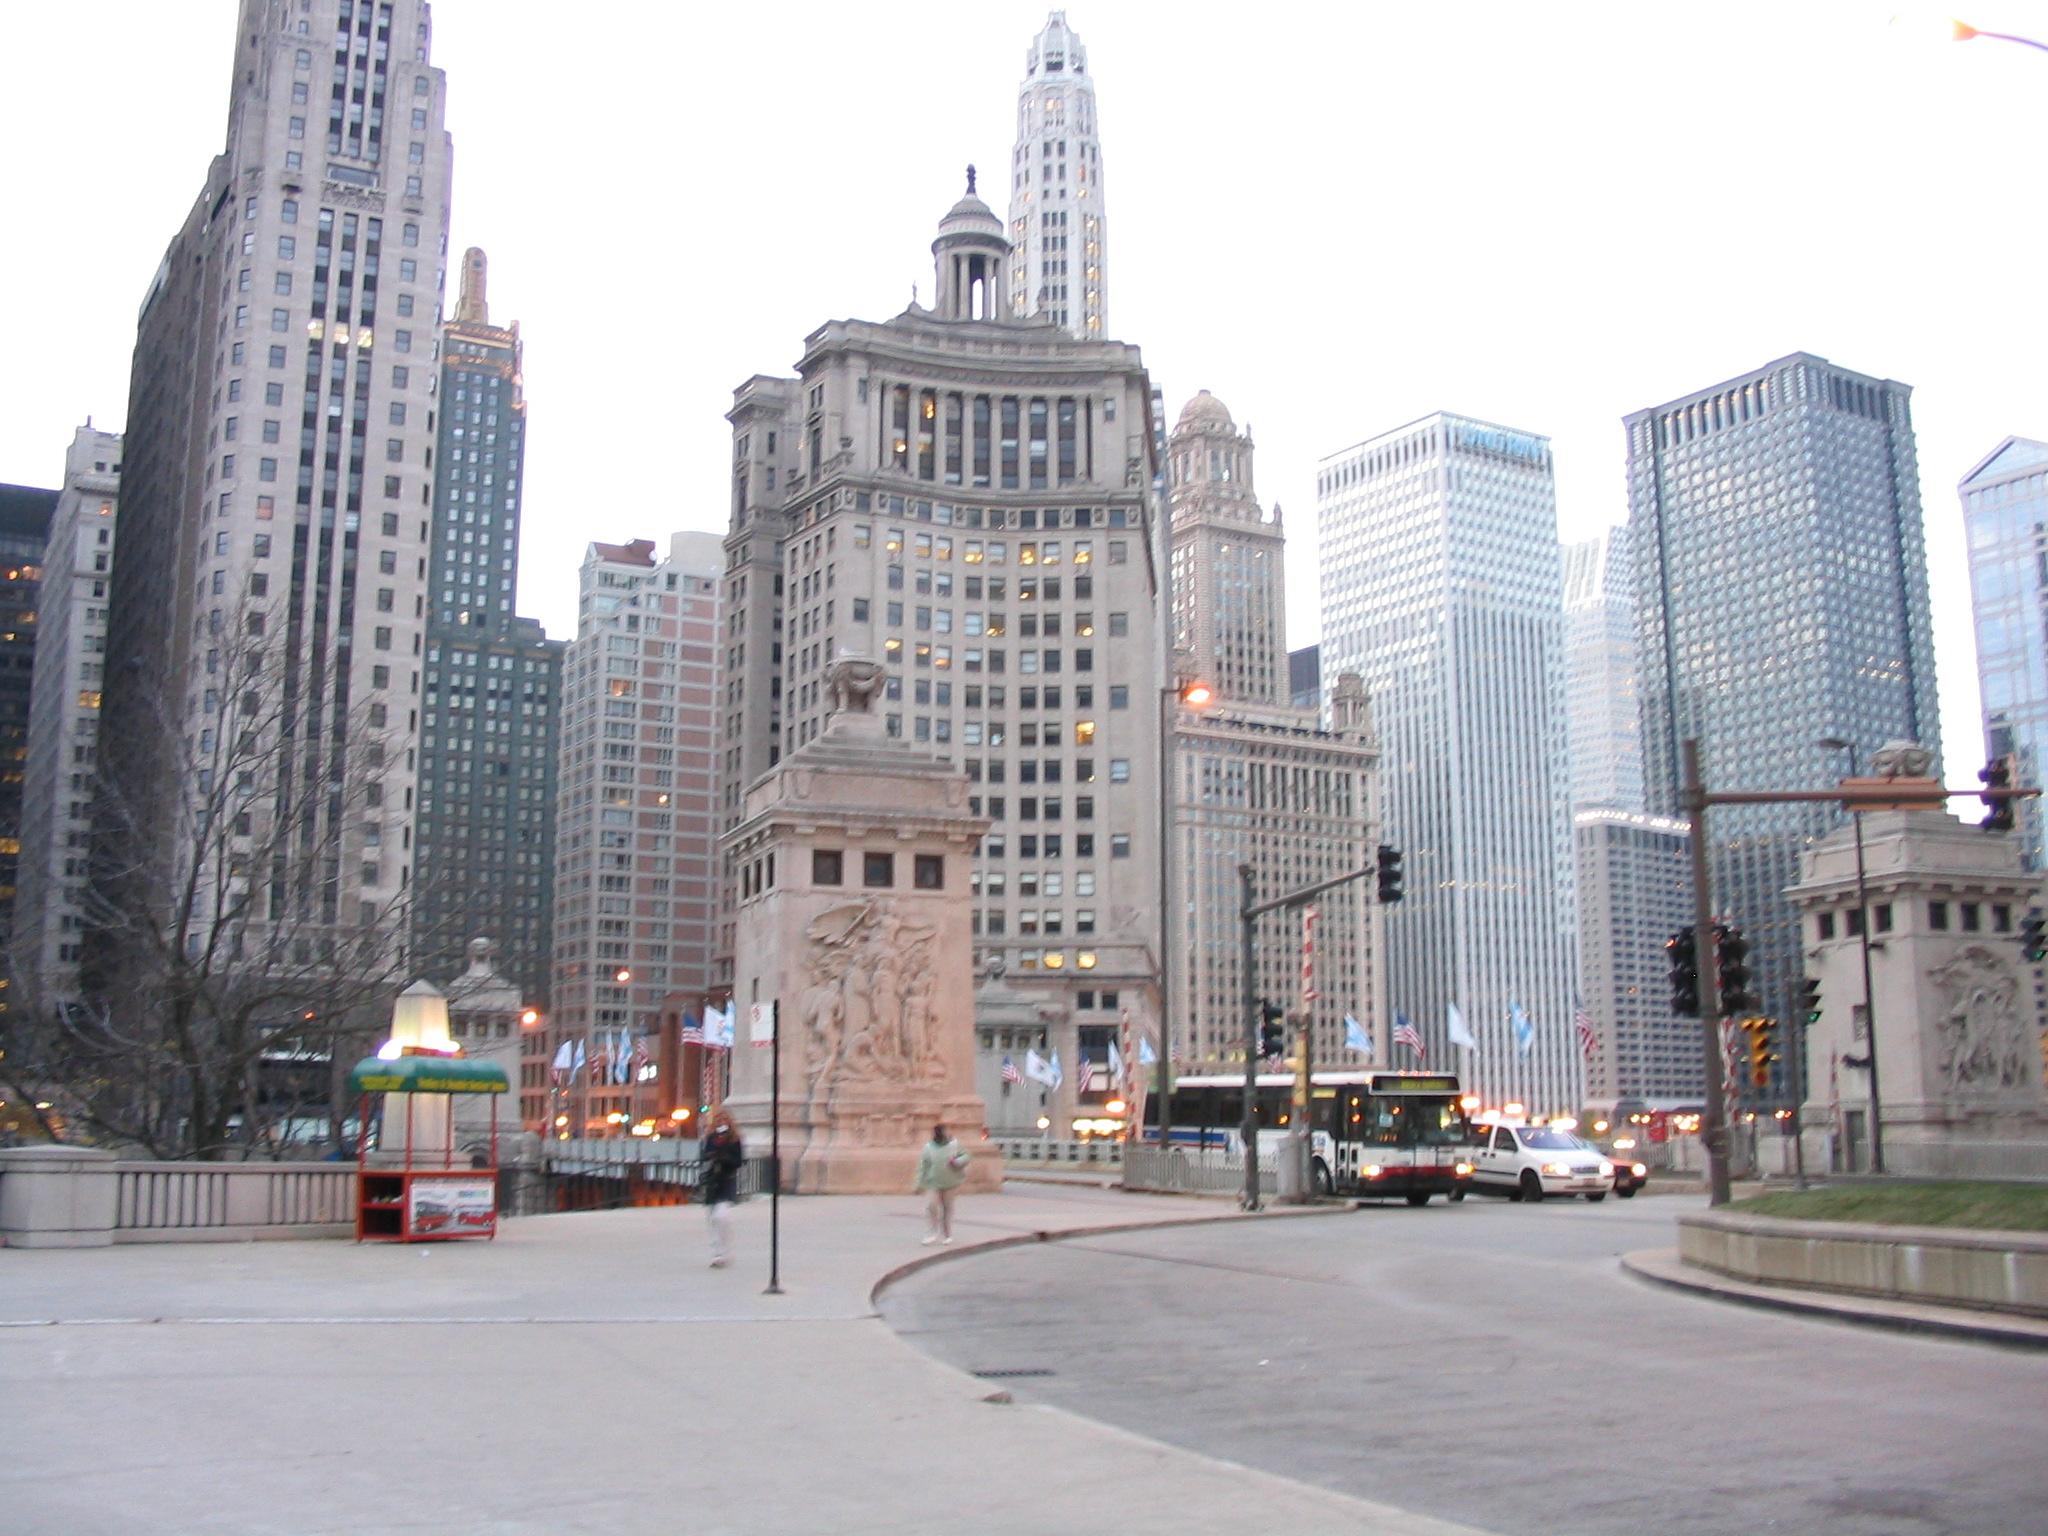 File:Downtown Chicago Illinois Nov05 stb 2461.jpg